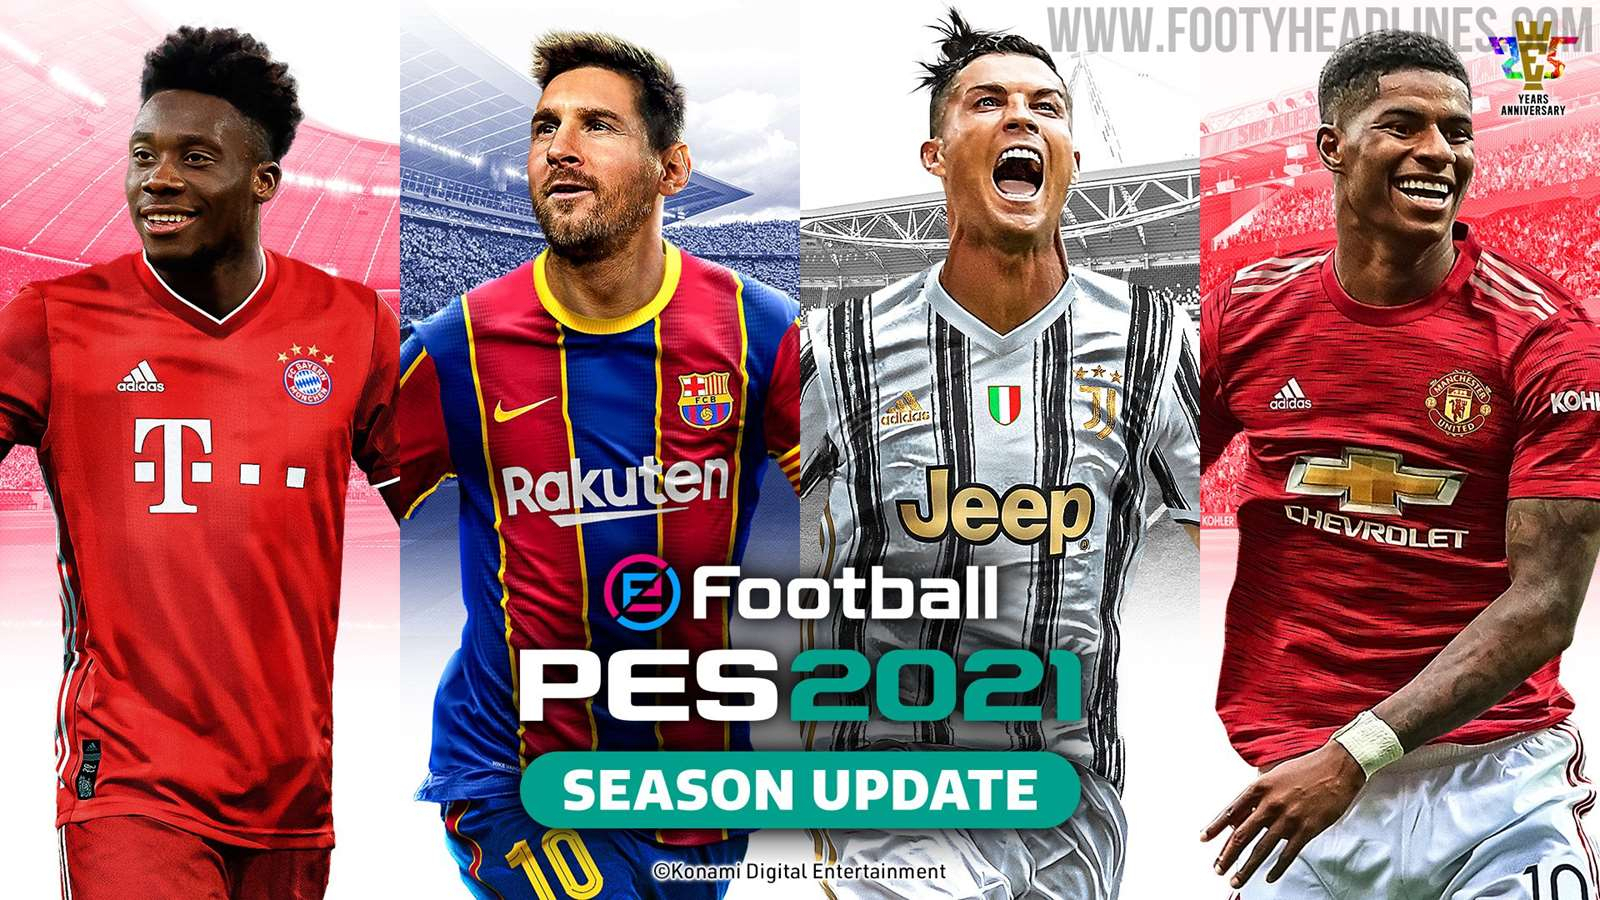 Messi + Ronaldo: Pes 2021 Cover Revealed - Footy Headlines